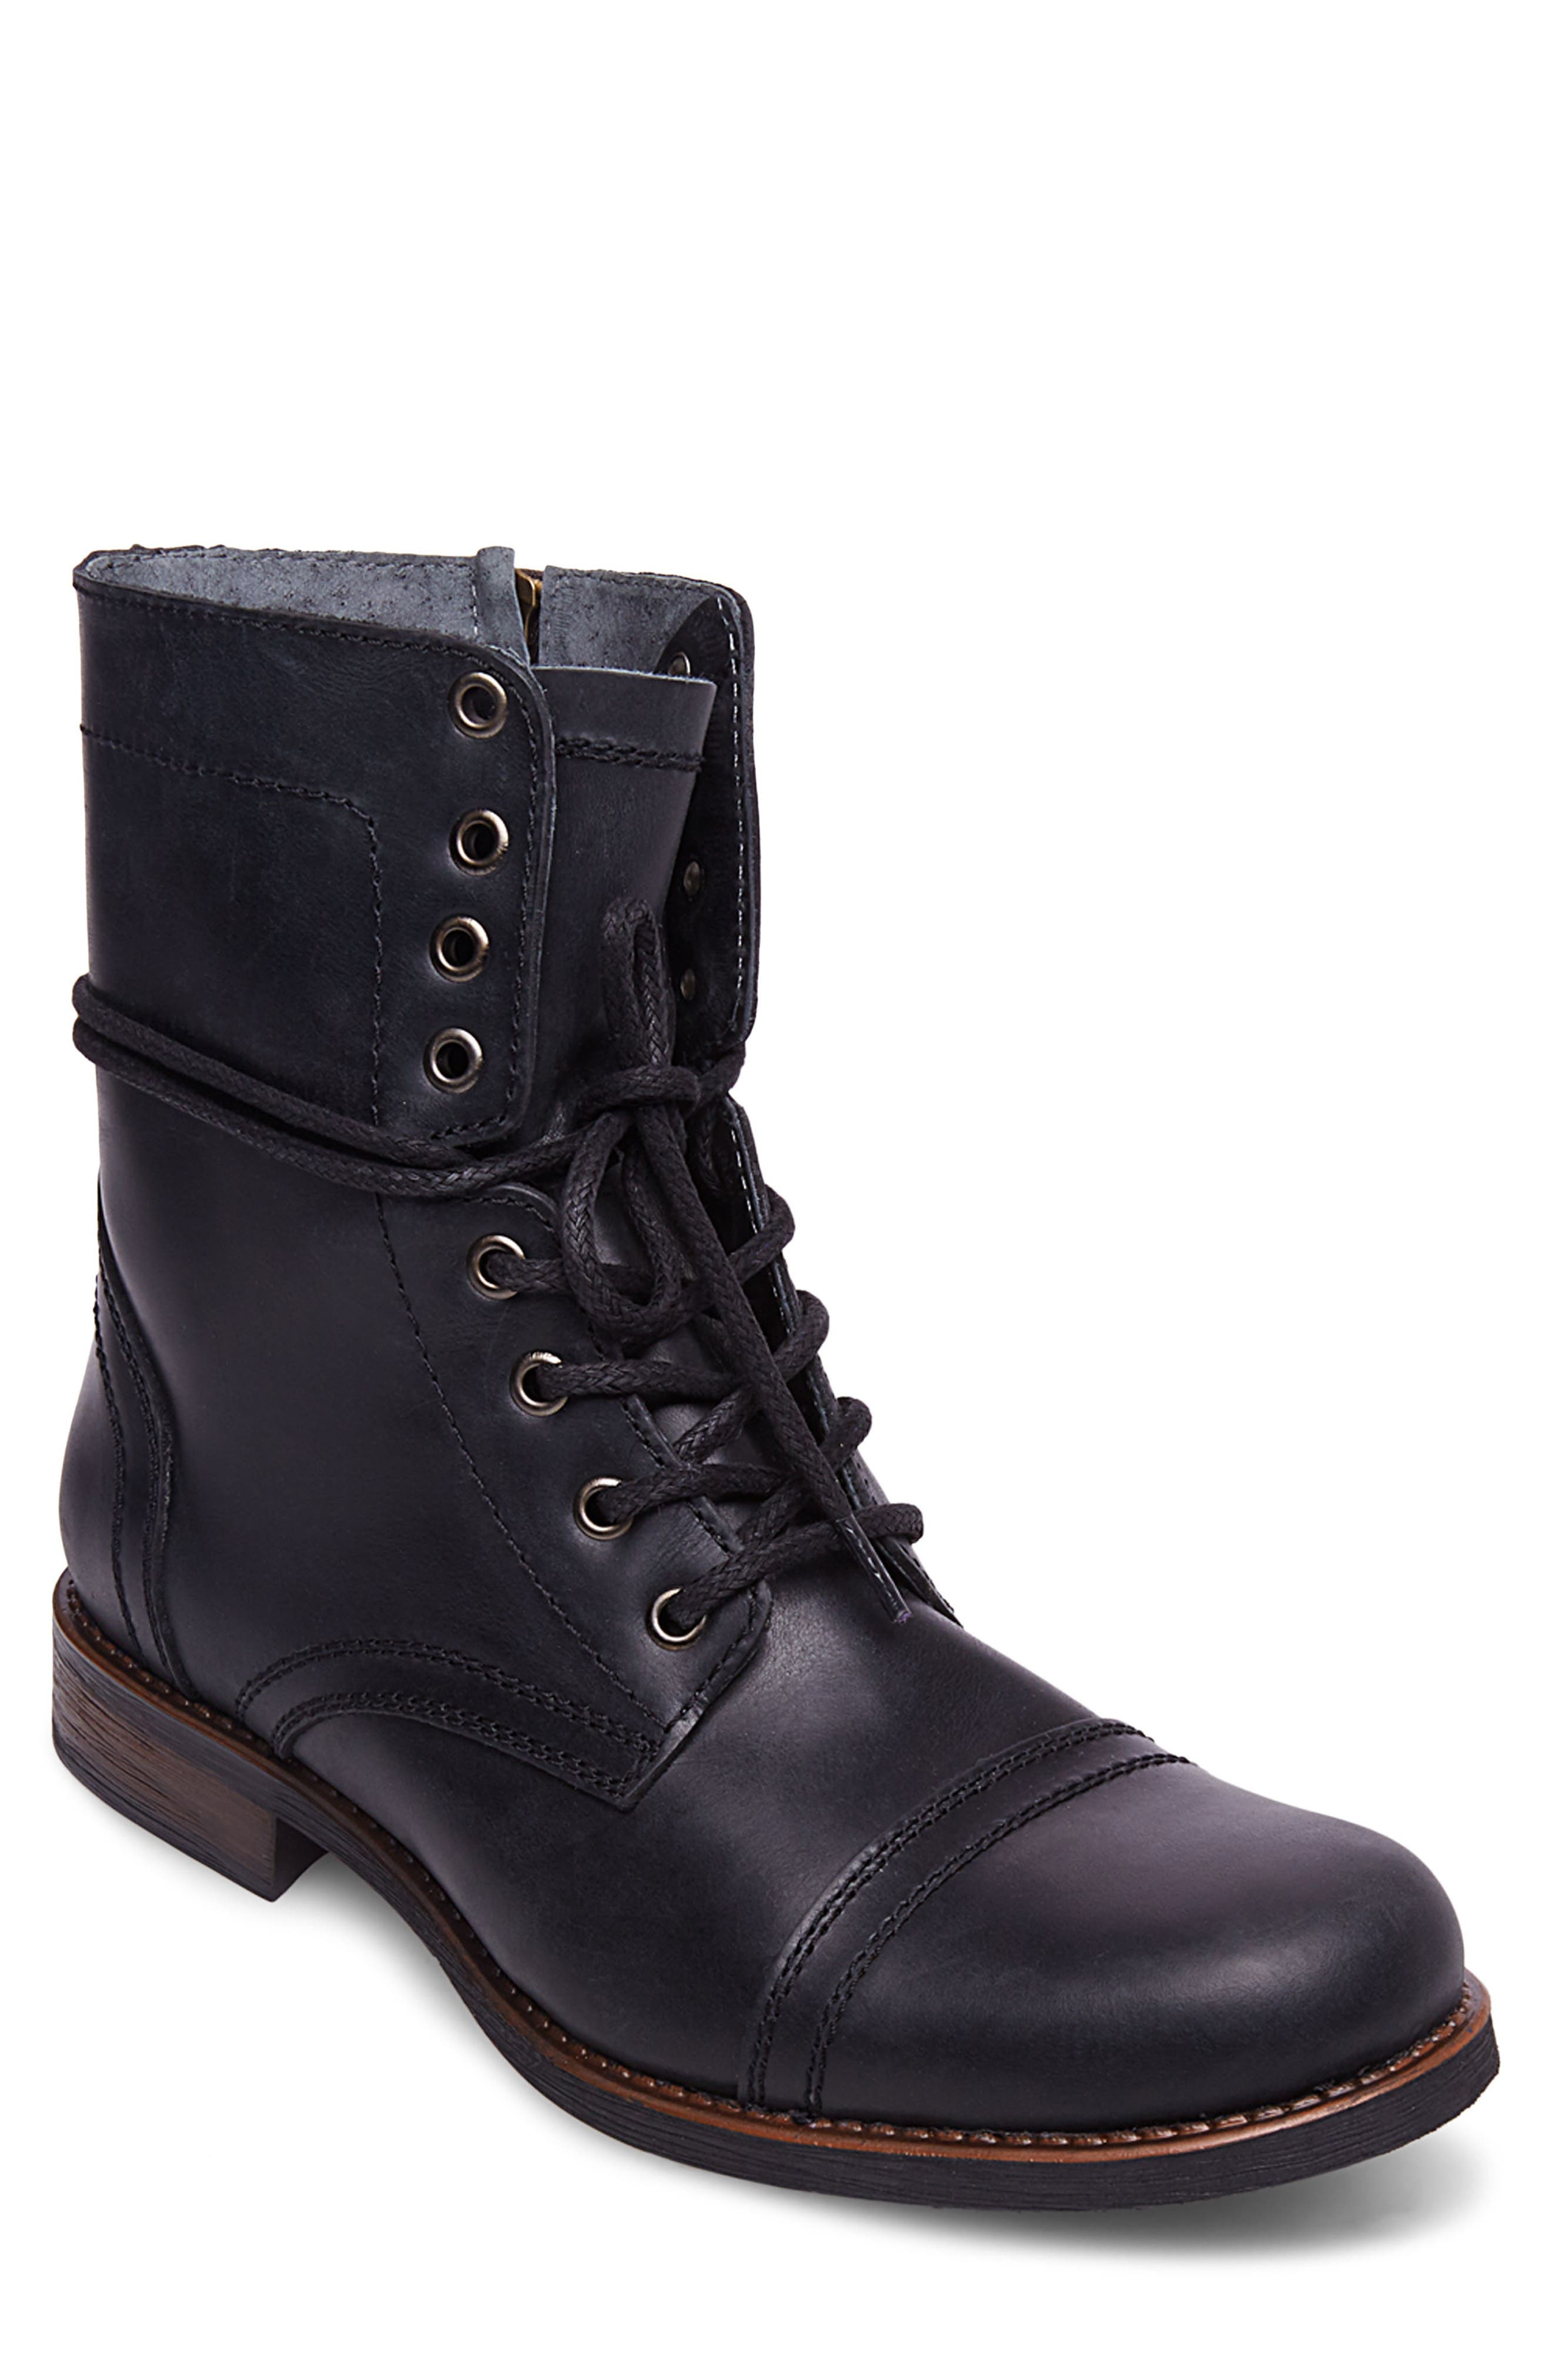 Troopah-C Cap Toe Boot,                         Main,                         color, Black Leather